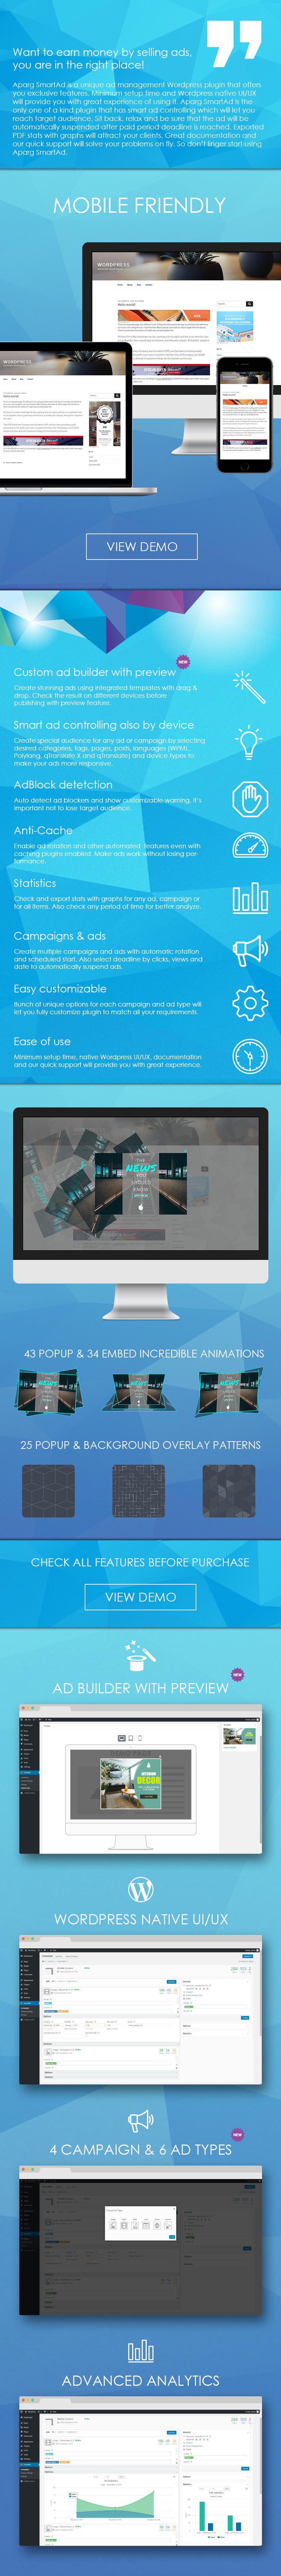 Aparg SmartAd Features